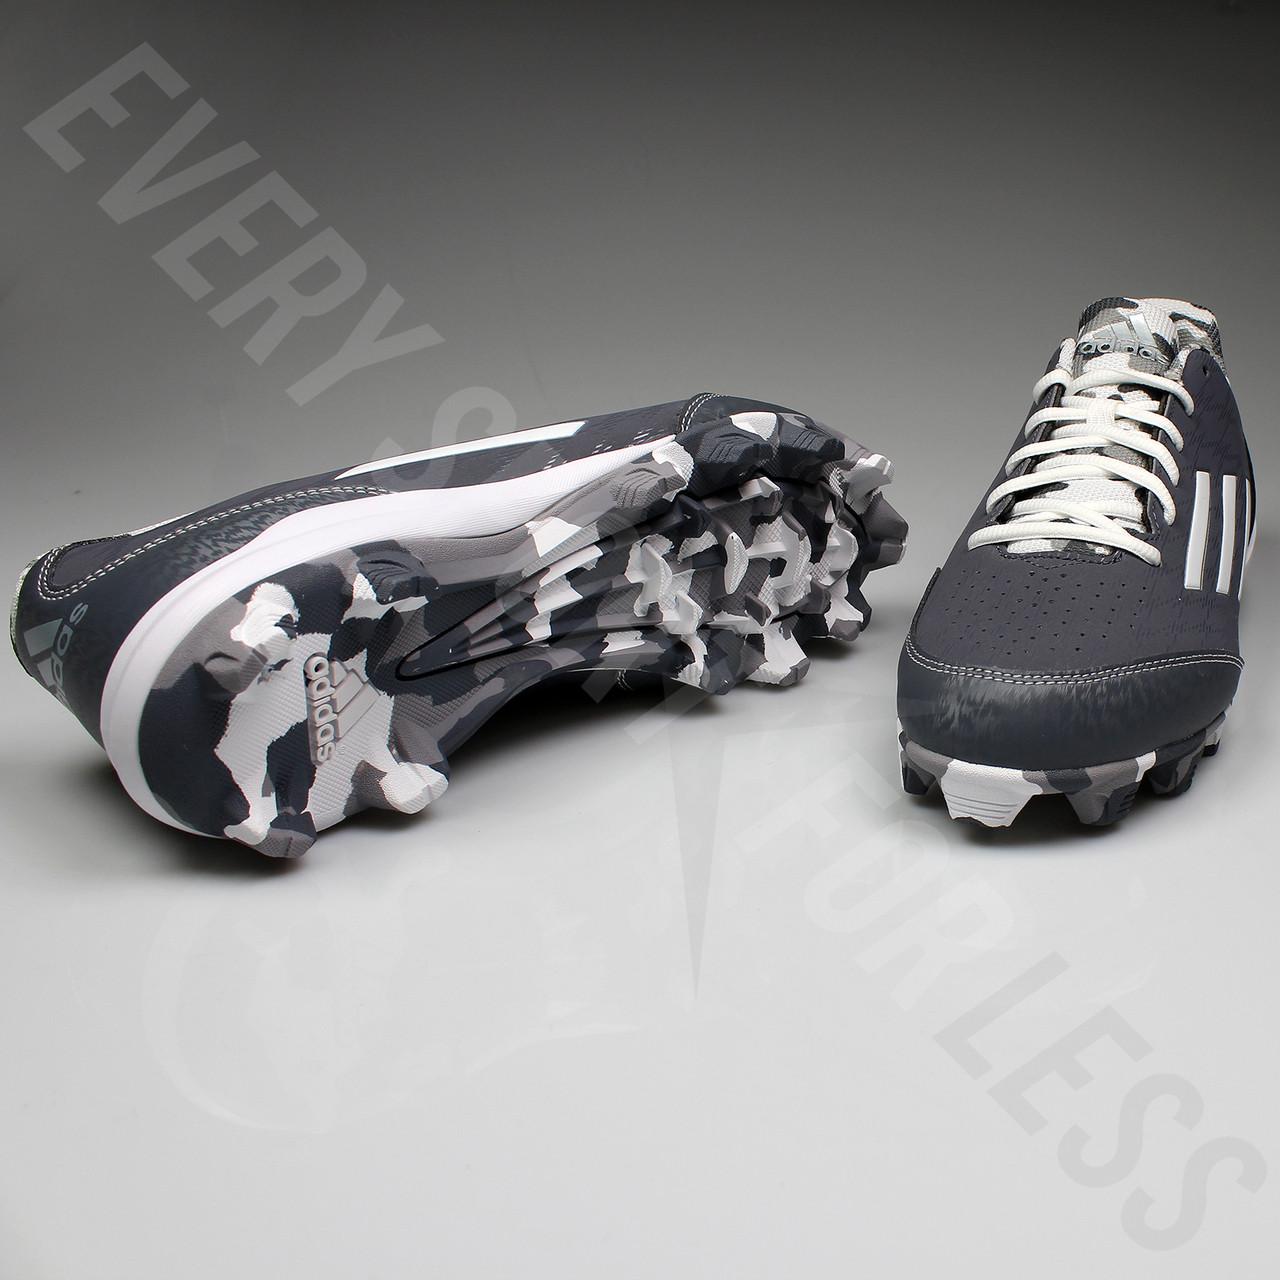 ... Grey · Adidas Wheelhouse 3 Men s Baseball Cleats S84778 - Onix b5136abe366